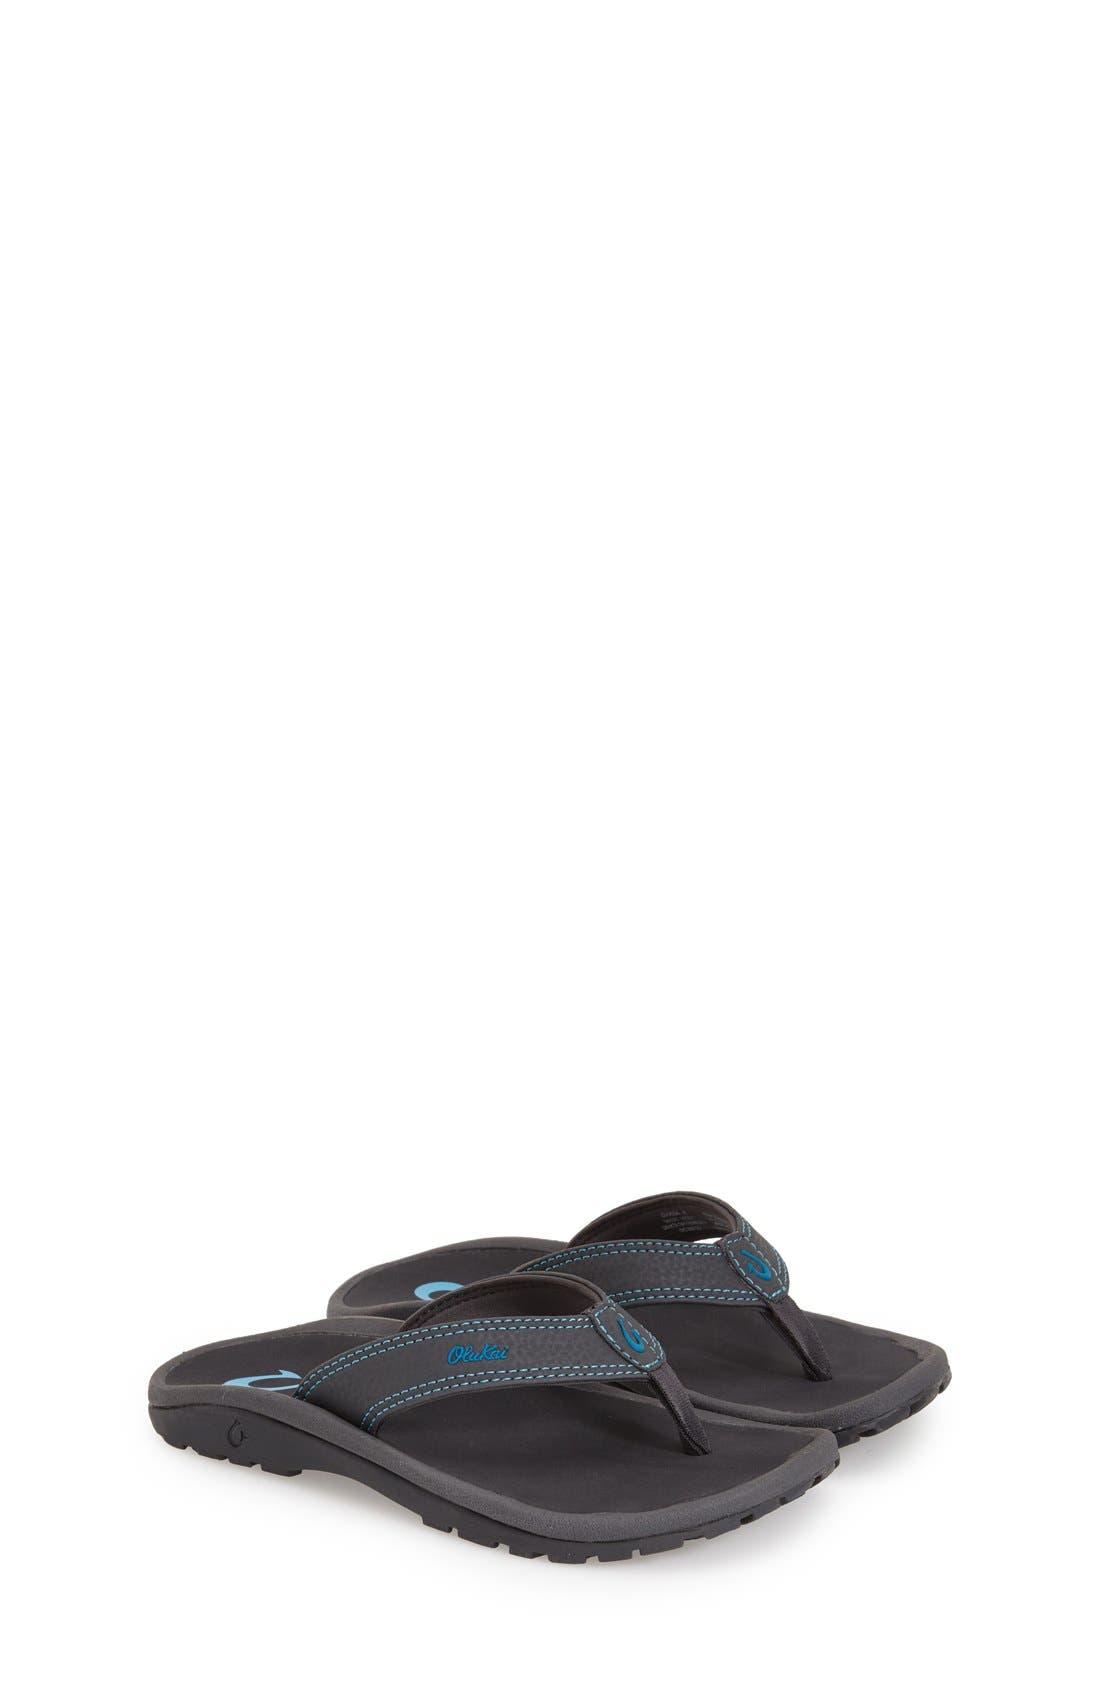 7f68ab7b77ea Big Boys  Sandals Shoes (Sizes 3.5-7)